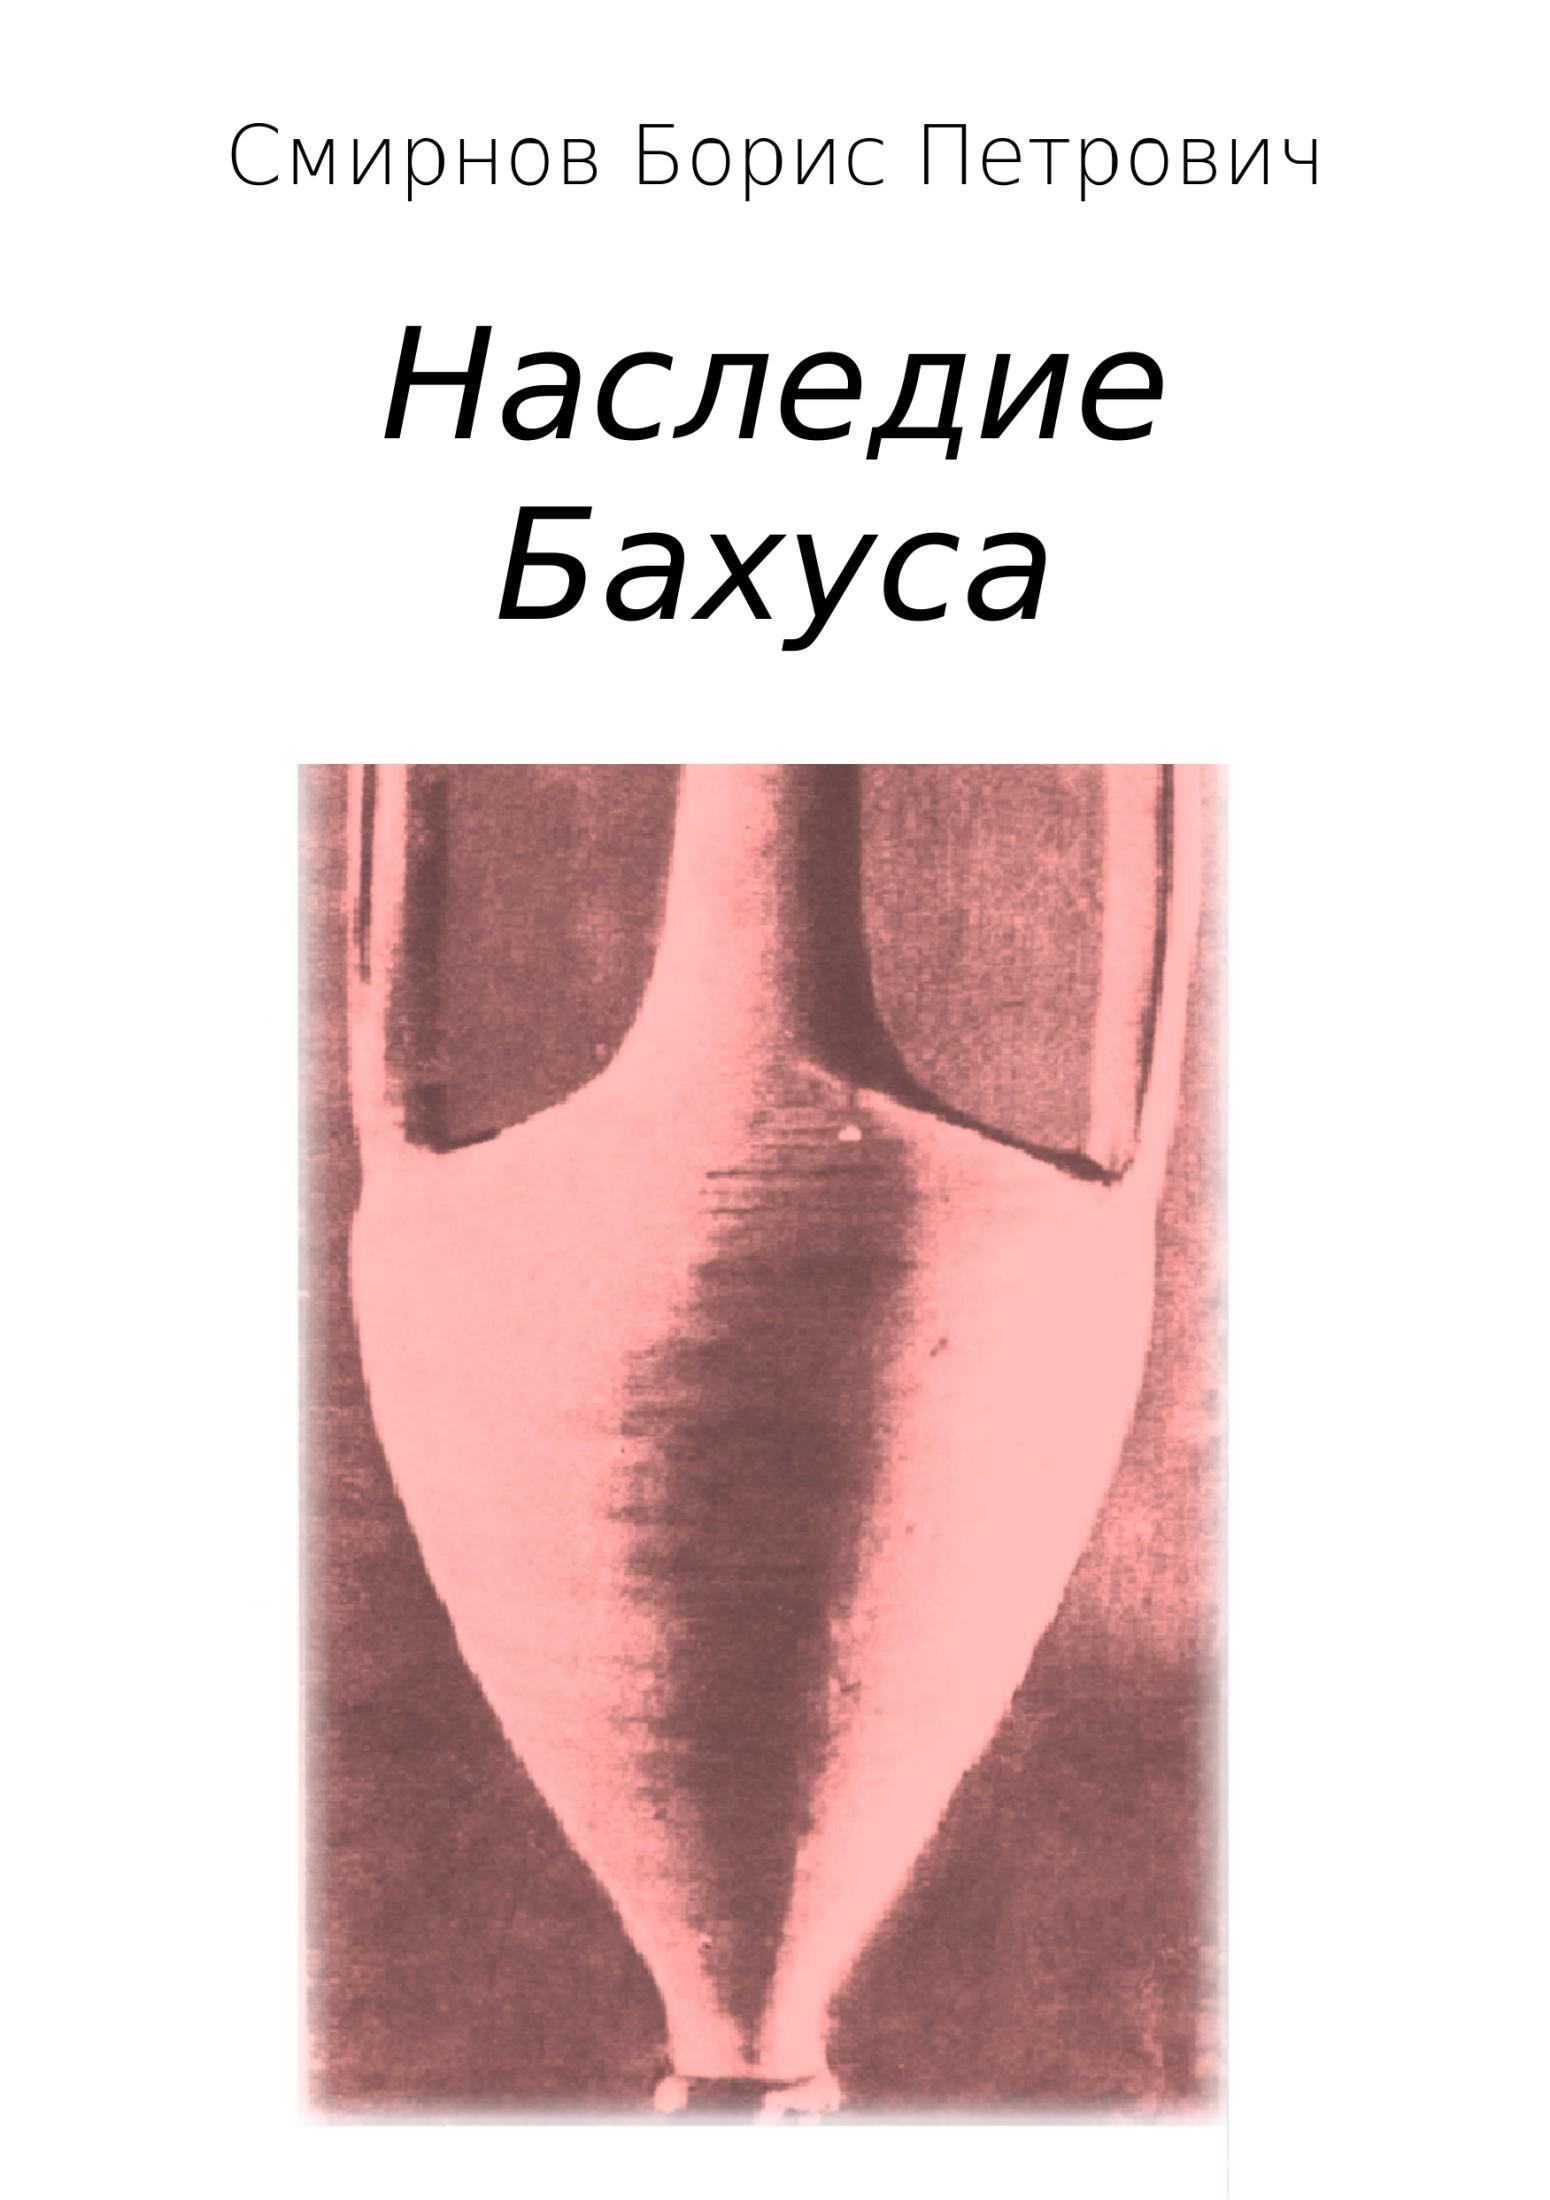 Борис Петрович Смирнов Наследие Бахуса оз кларк история вина в 100 бутылках от бахуса до бордо и дальше